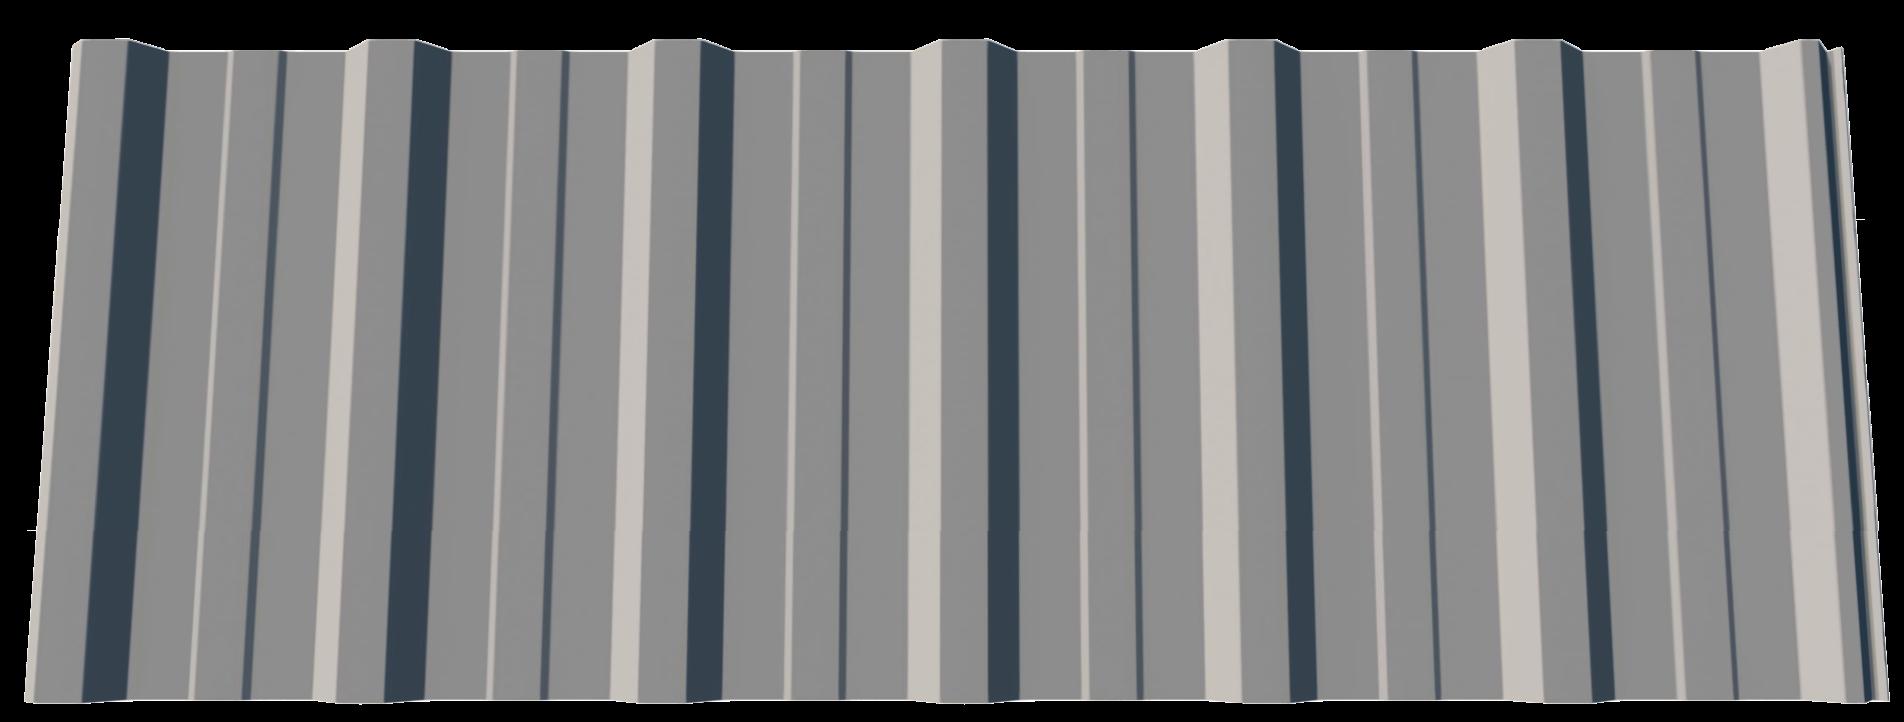 damwandplaten t18 dak